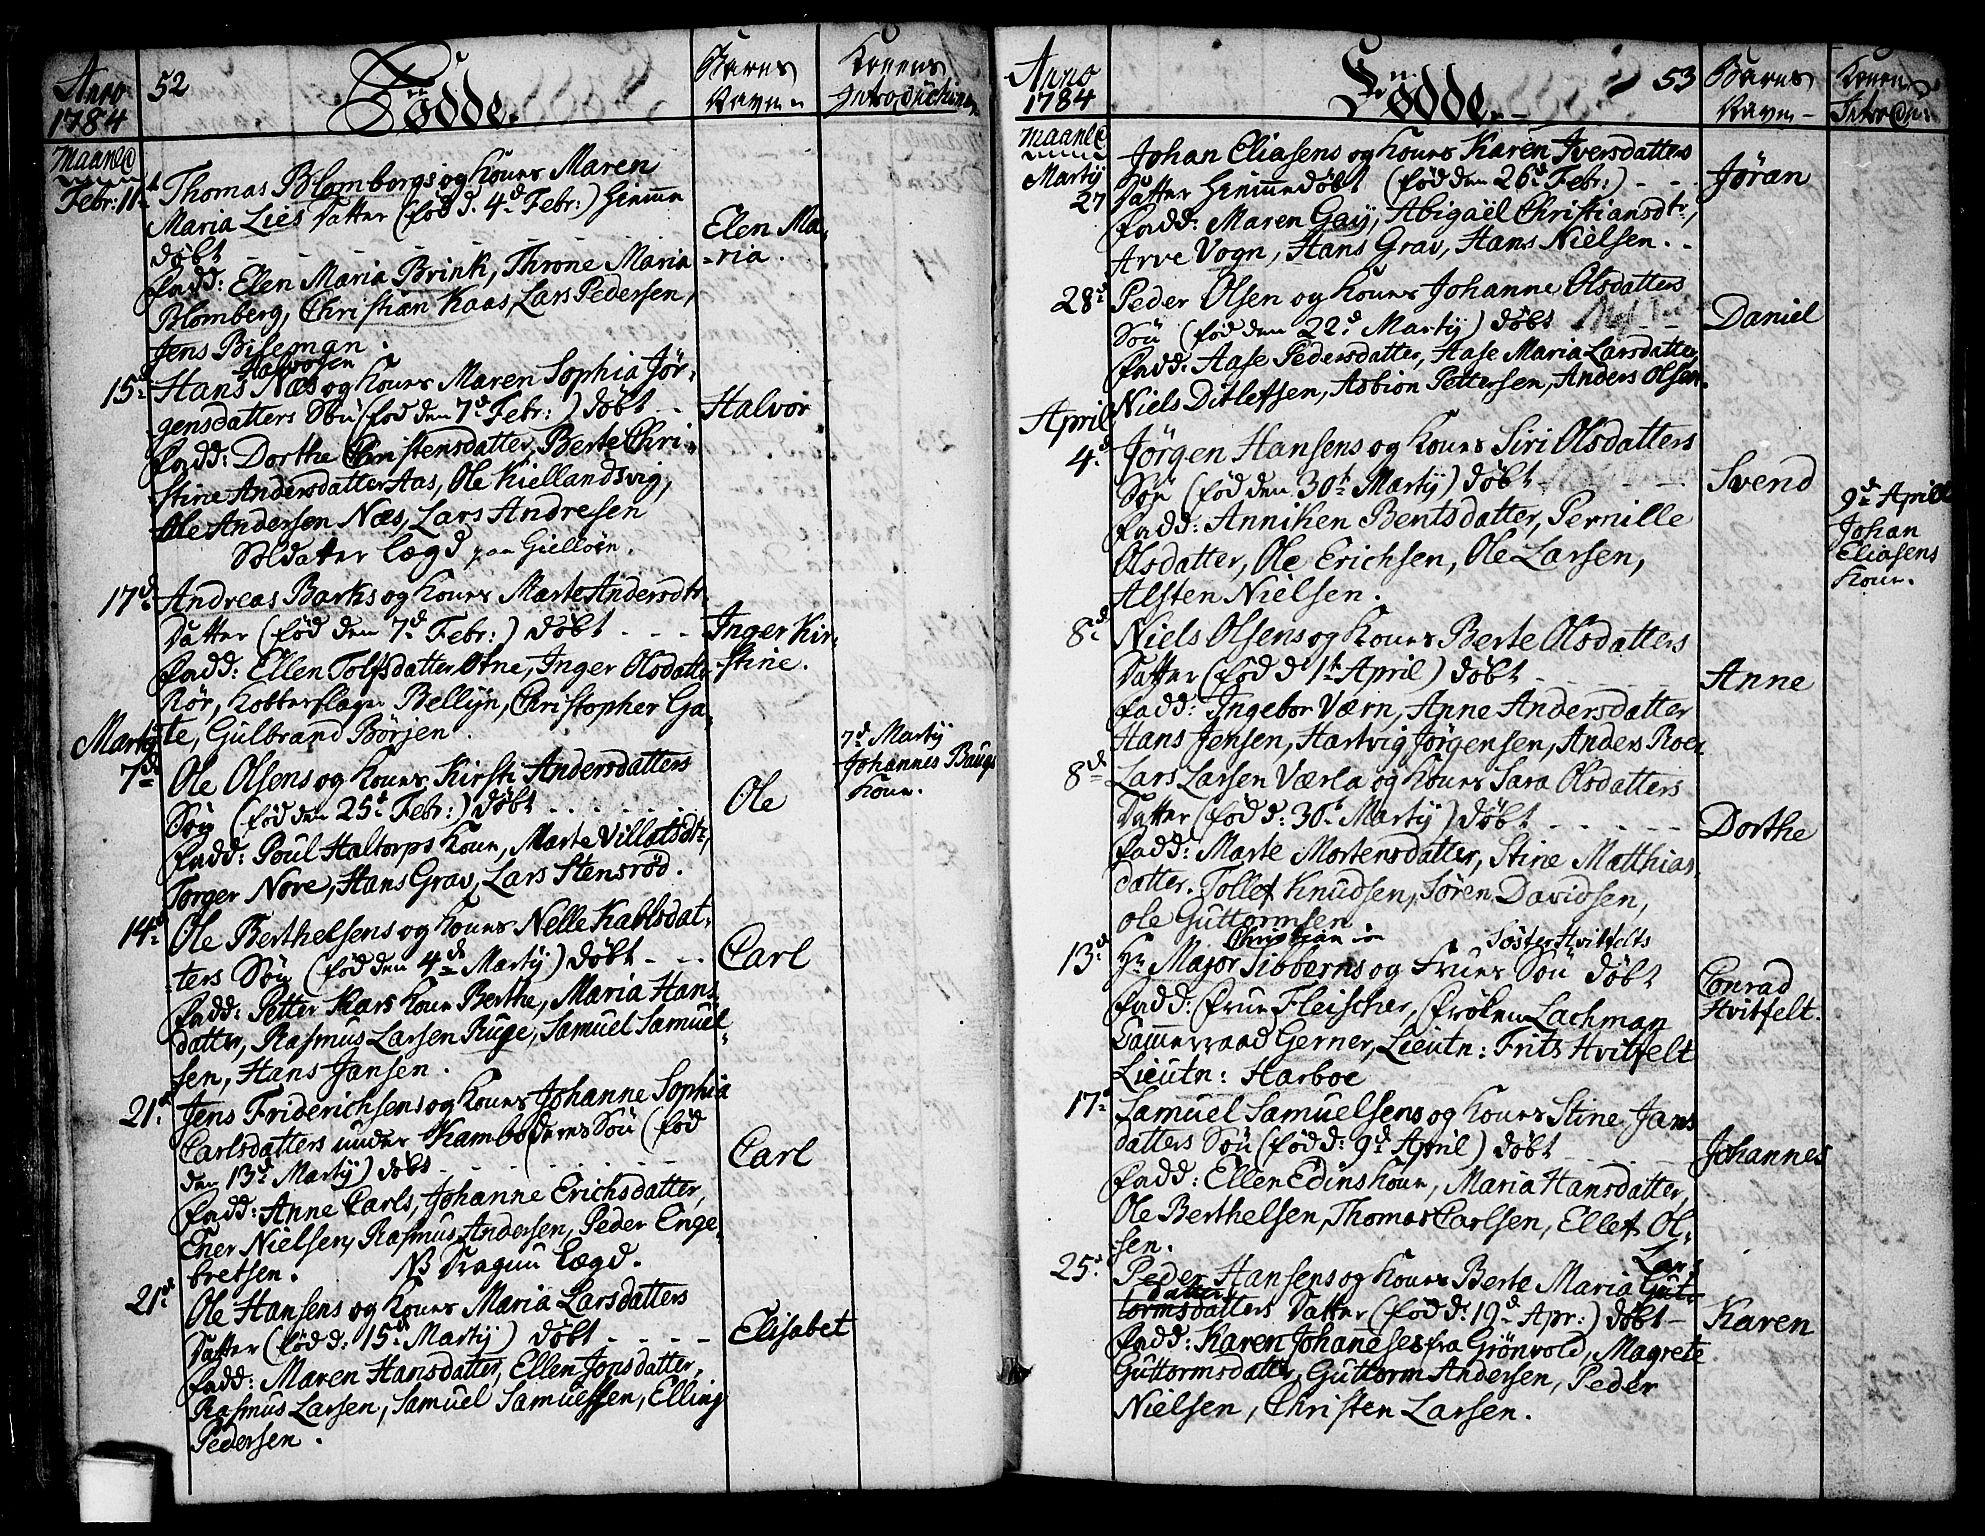 SAO, Moss prestekontor Kirkebøker, F/Fa/Faa/L0003: Parish register (official) no. I 3, 1779-1814, p. 52-53